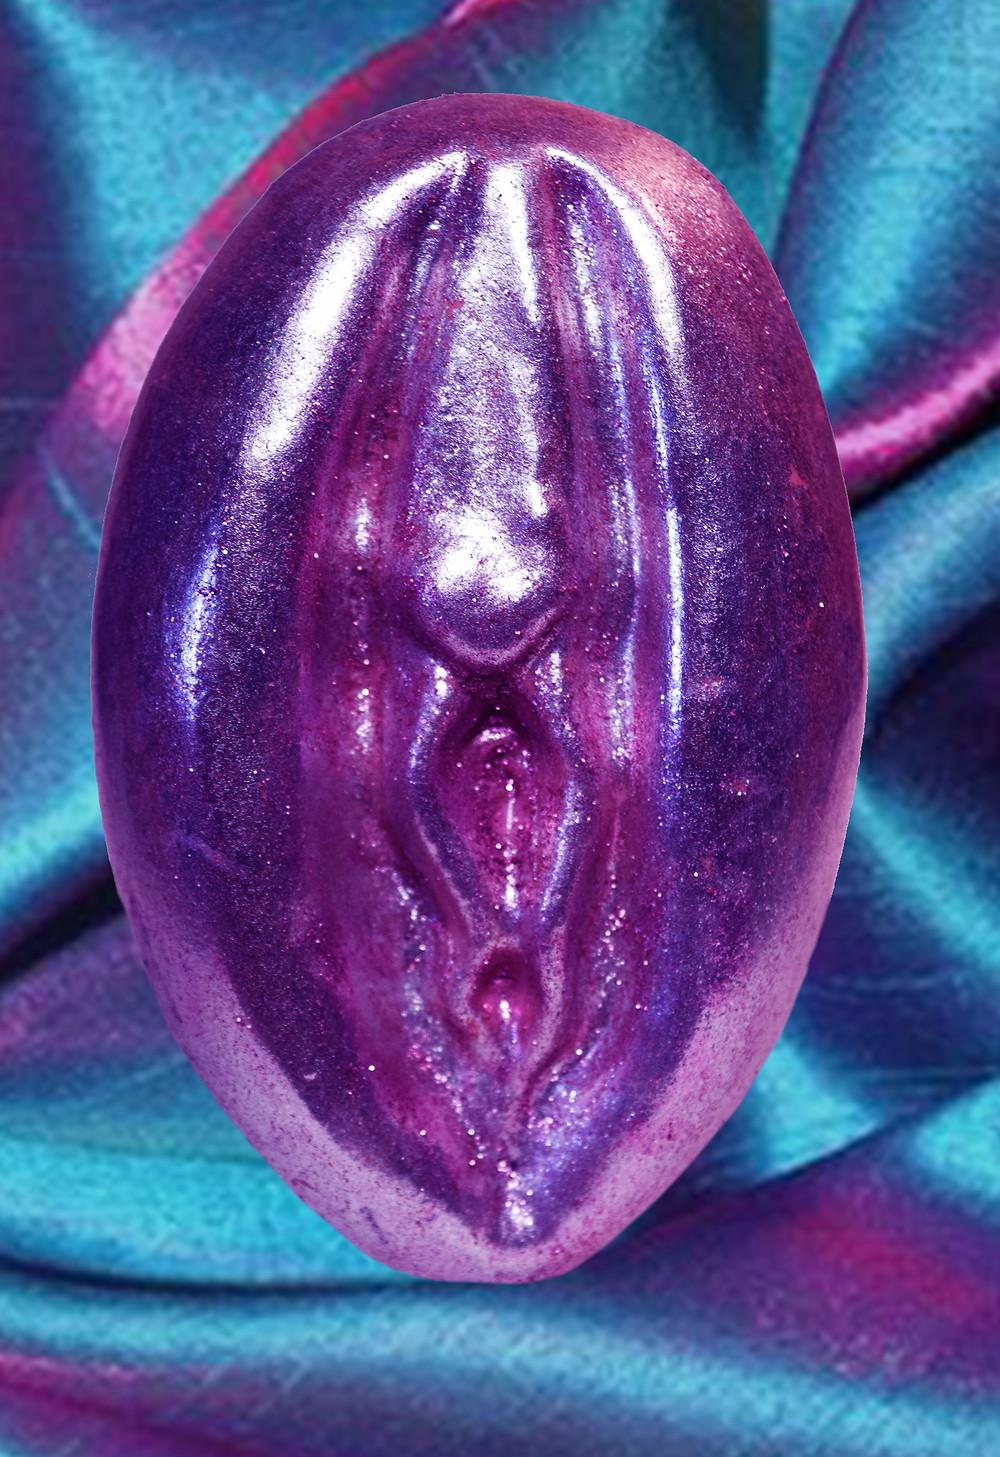 VAGINA, soap, vagina soap, pussy soap, vulva, glitter, hester street hair, howl magazine, howl mag, julia de la torre, fun, kitsch, gift, penis, dildo, penis soap, glitter, pink, beautiful, amazing, purple, pink